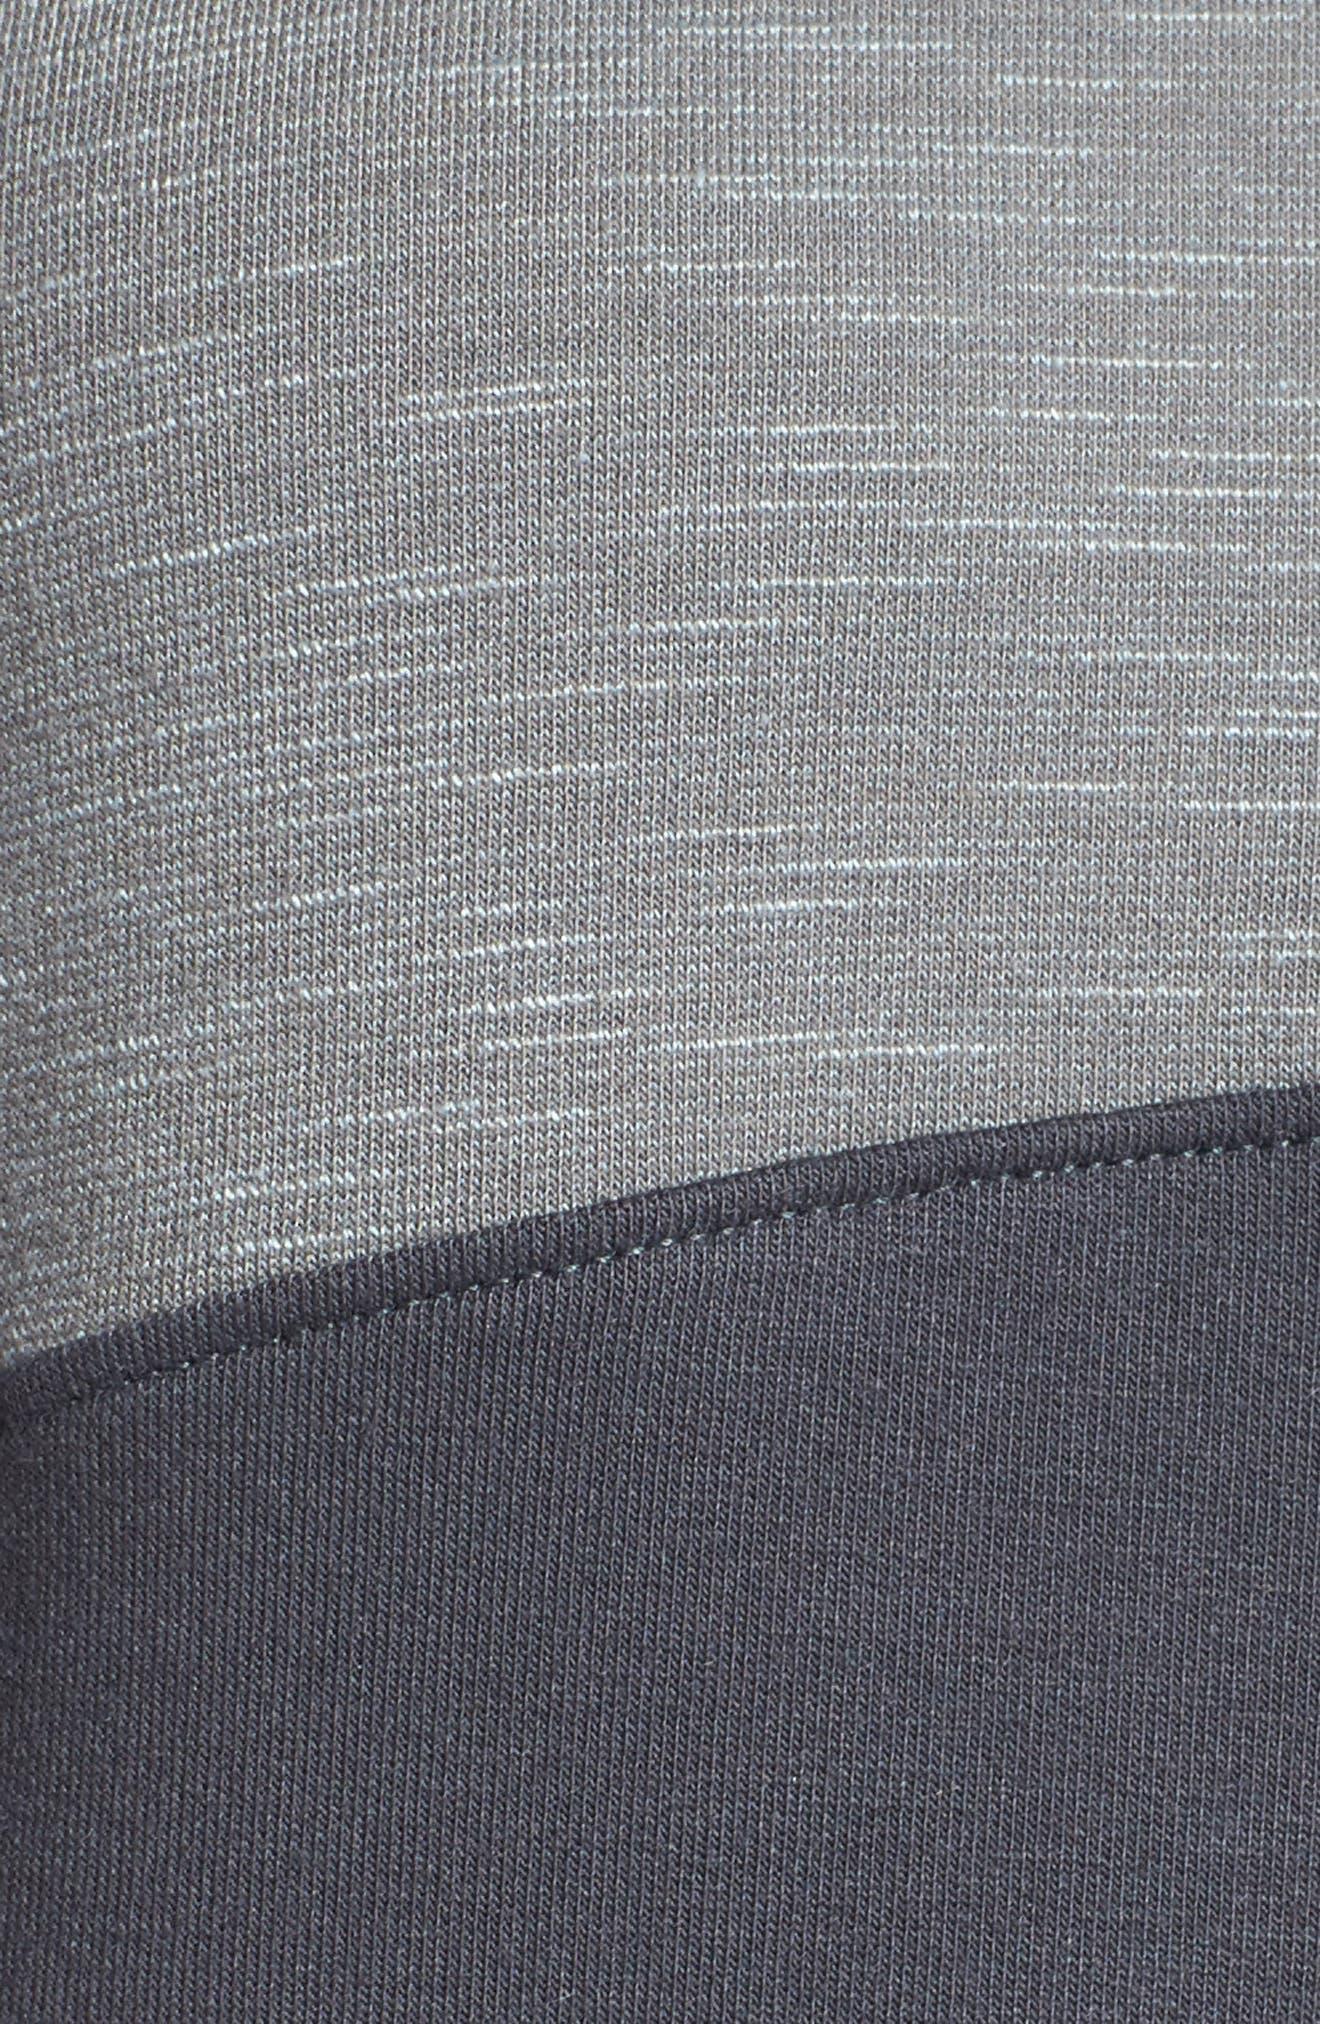 Alternate Image 5  - Under Armour Threadborne Pullover